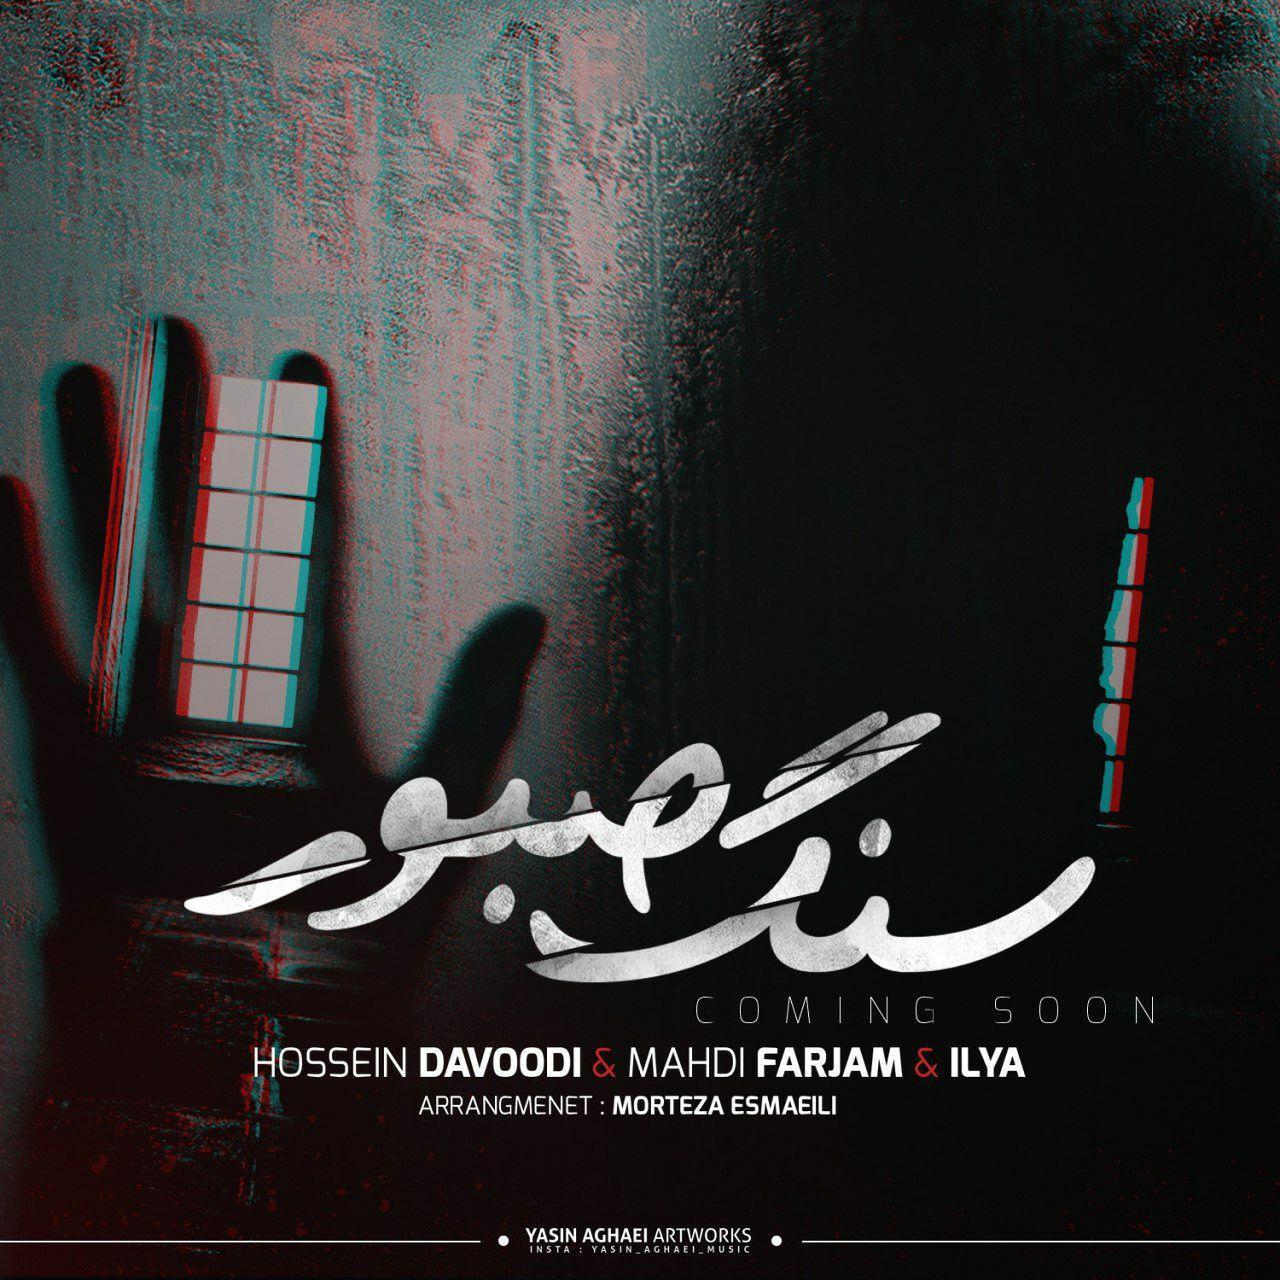 hossein davoodi mahdi farjam ilya sang saboor - دانلود آهنگ حسین داوودی و مهدی فرجام و ایلیا به نام سنگ صبور